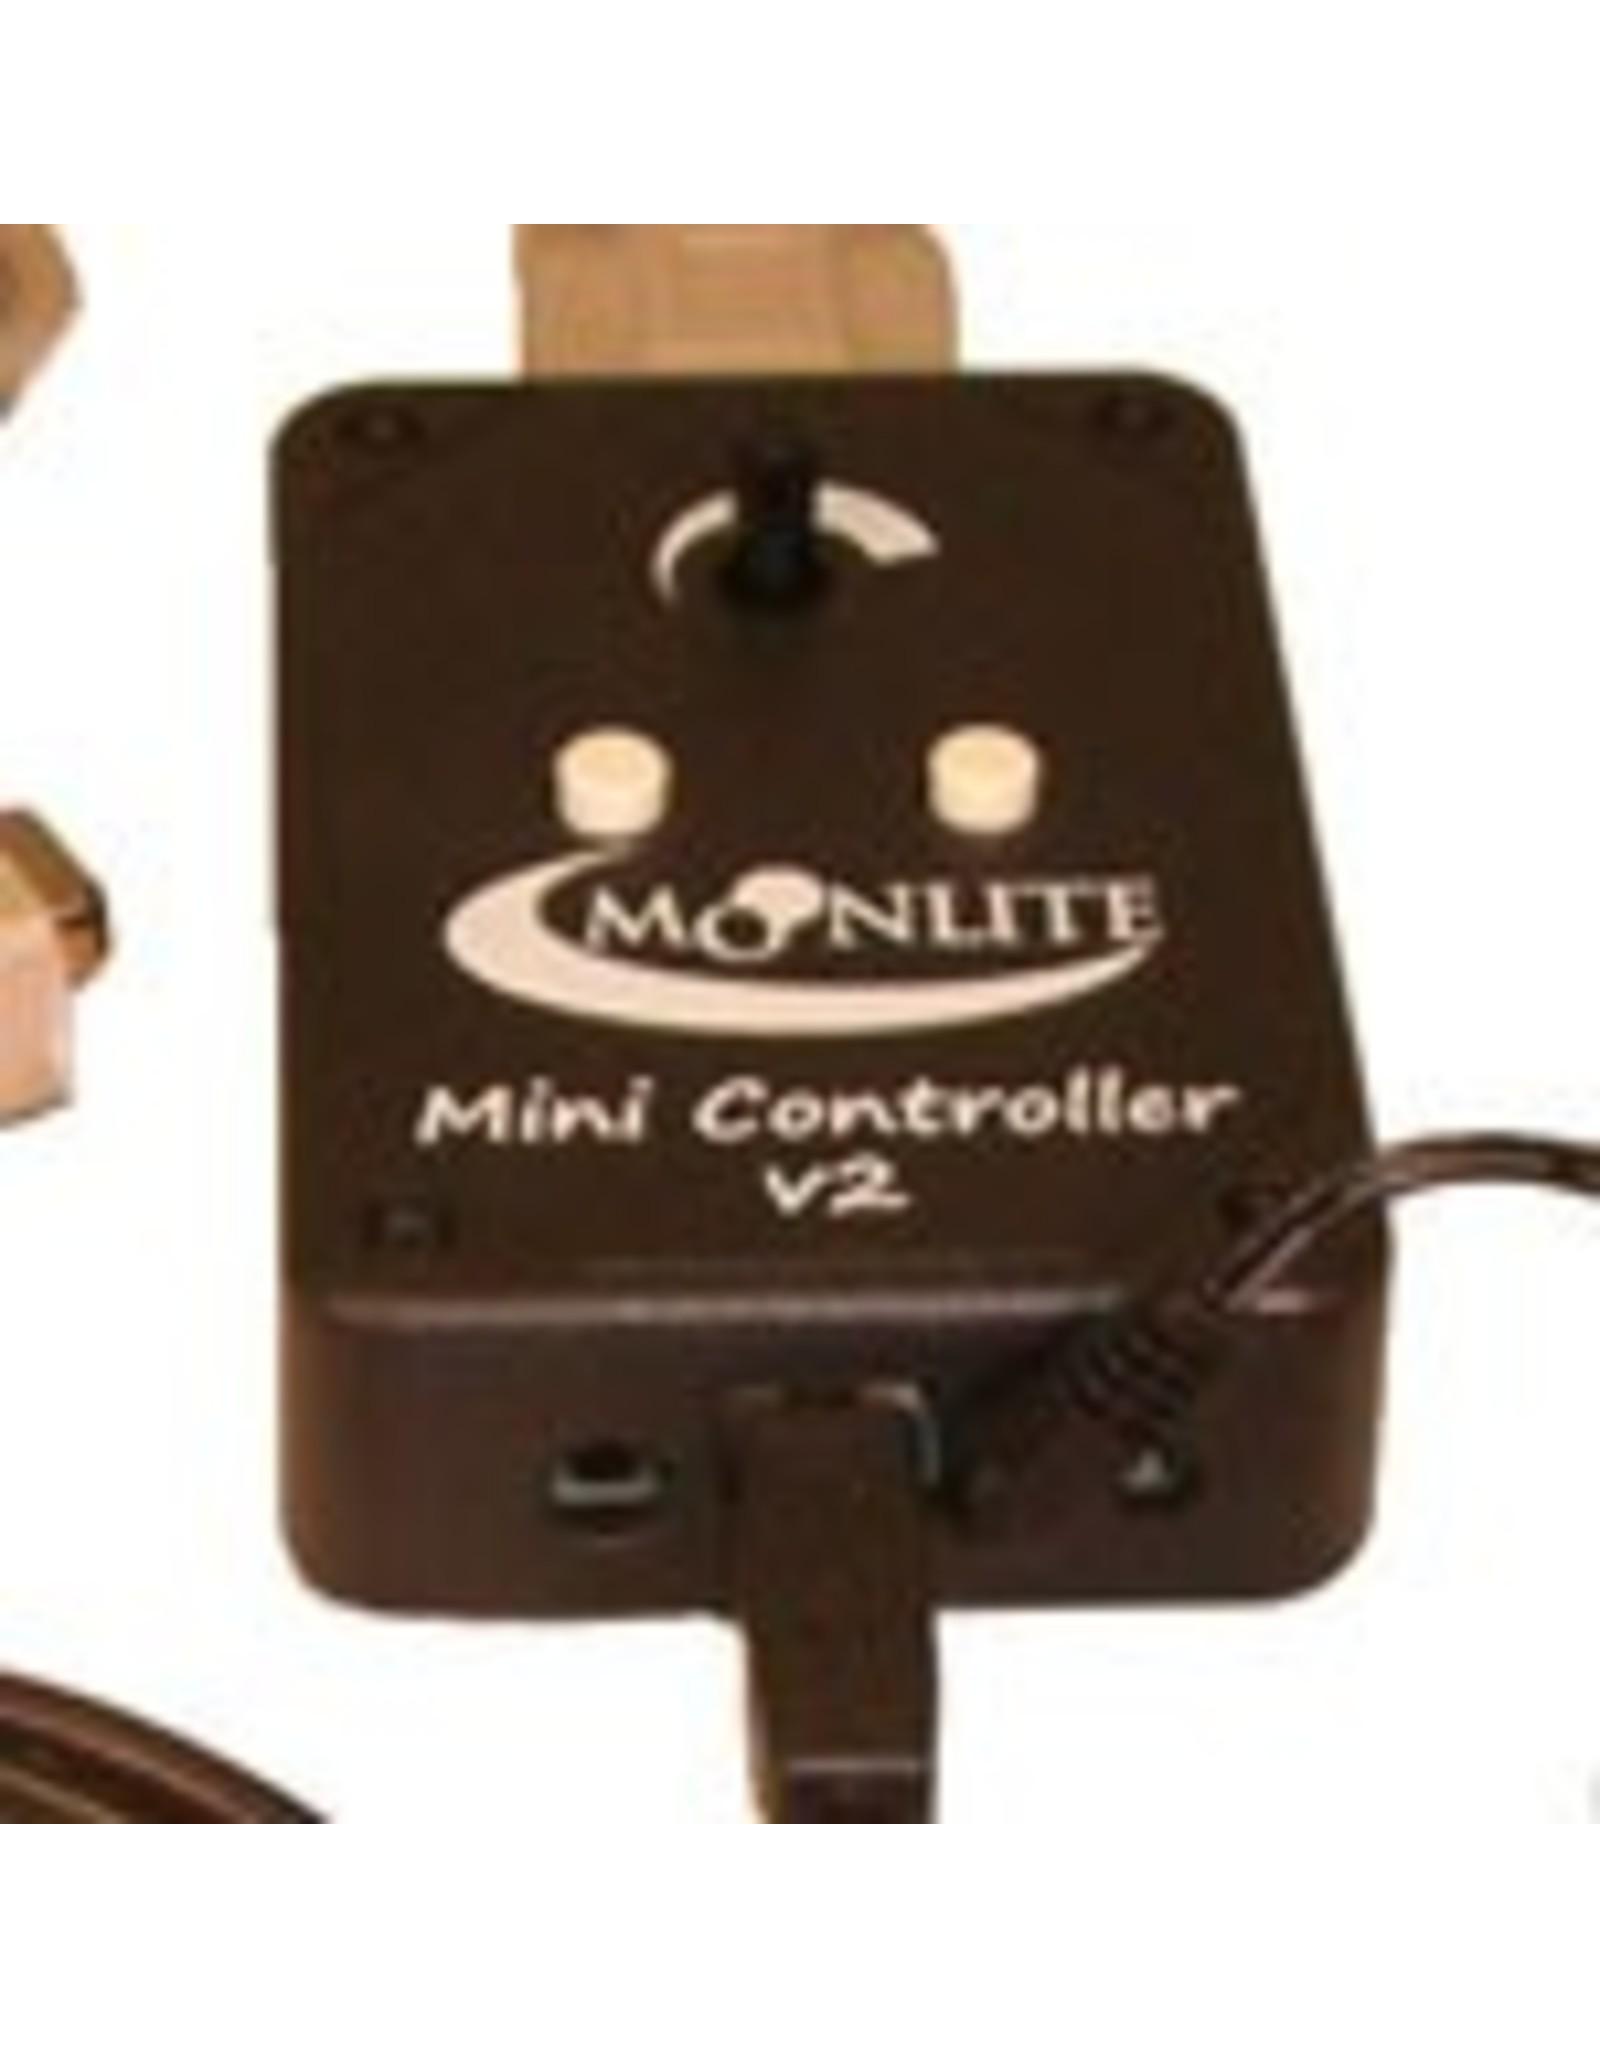 Moonlite Moonlite Mini-V2 controller for High res stepper motors (Model MTS-500-V2)